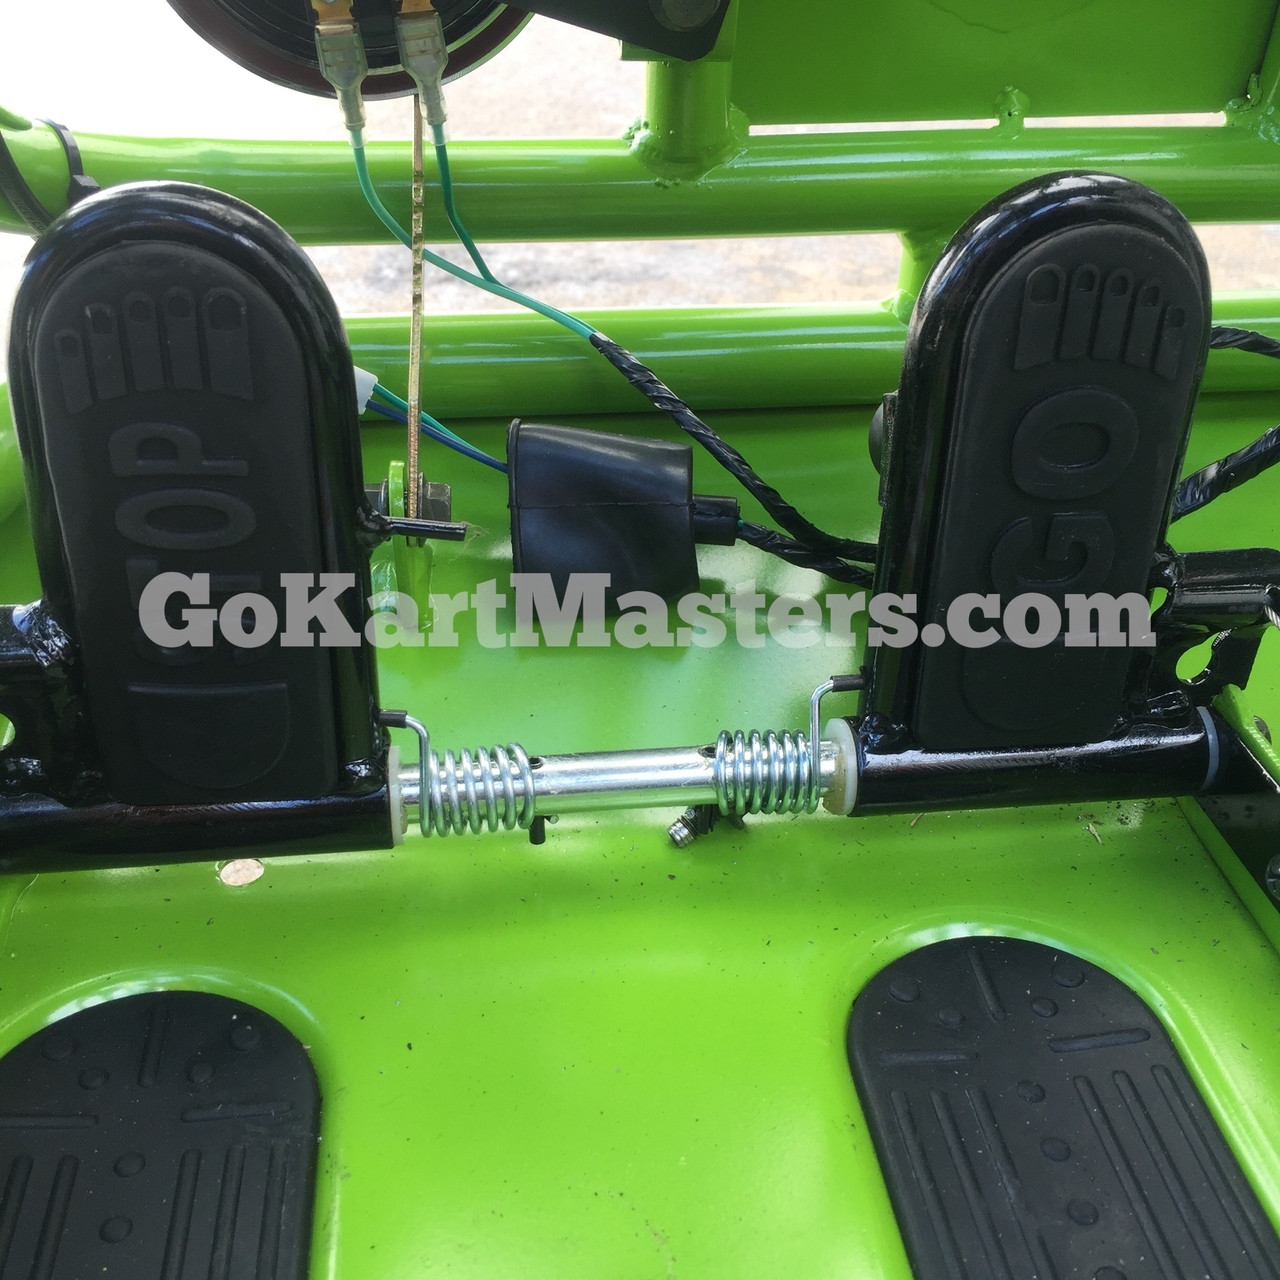 TrailMaster Mini XRX/R+ Go Kart - Throttle & Brake Pedals